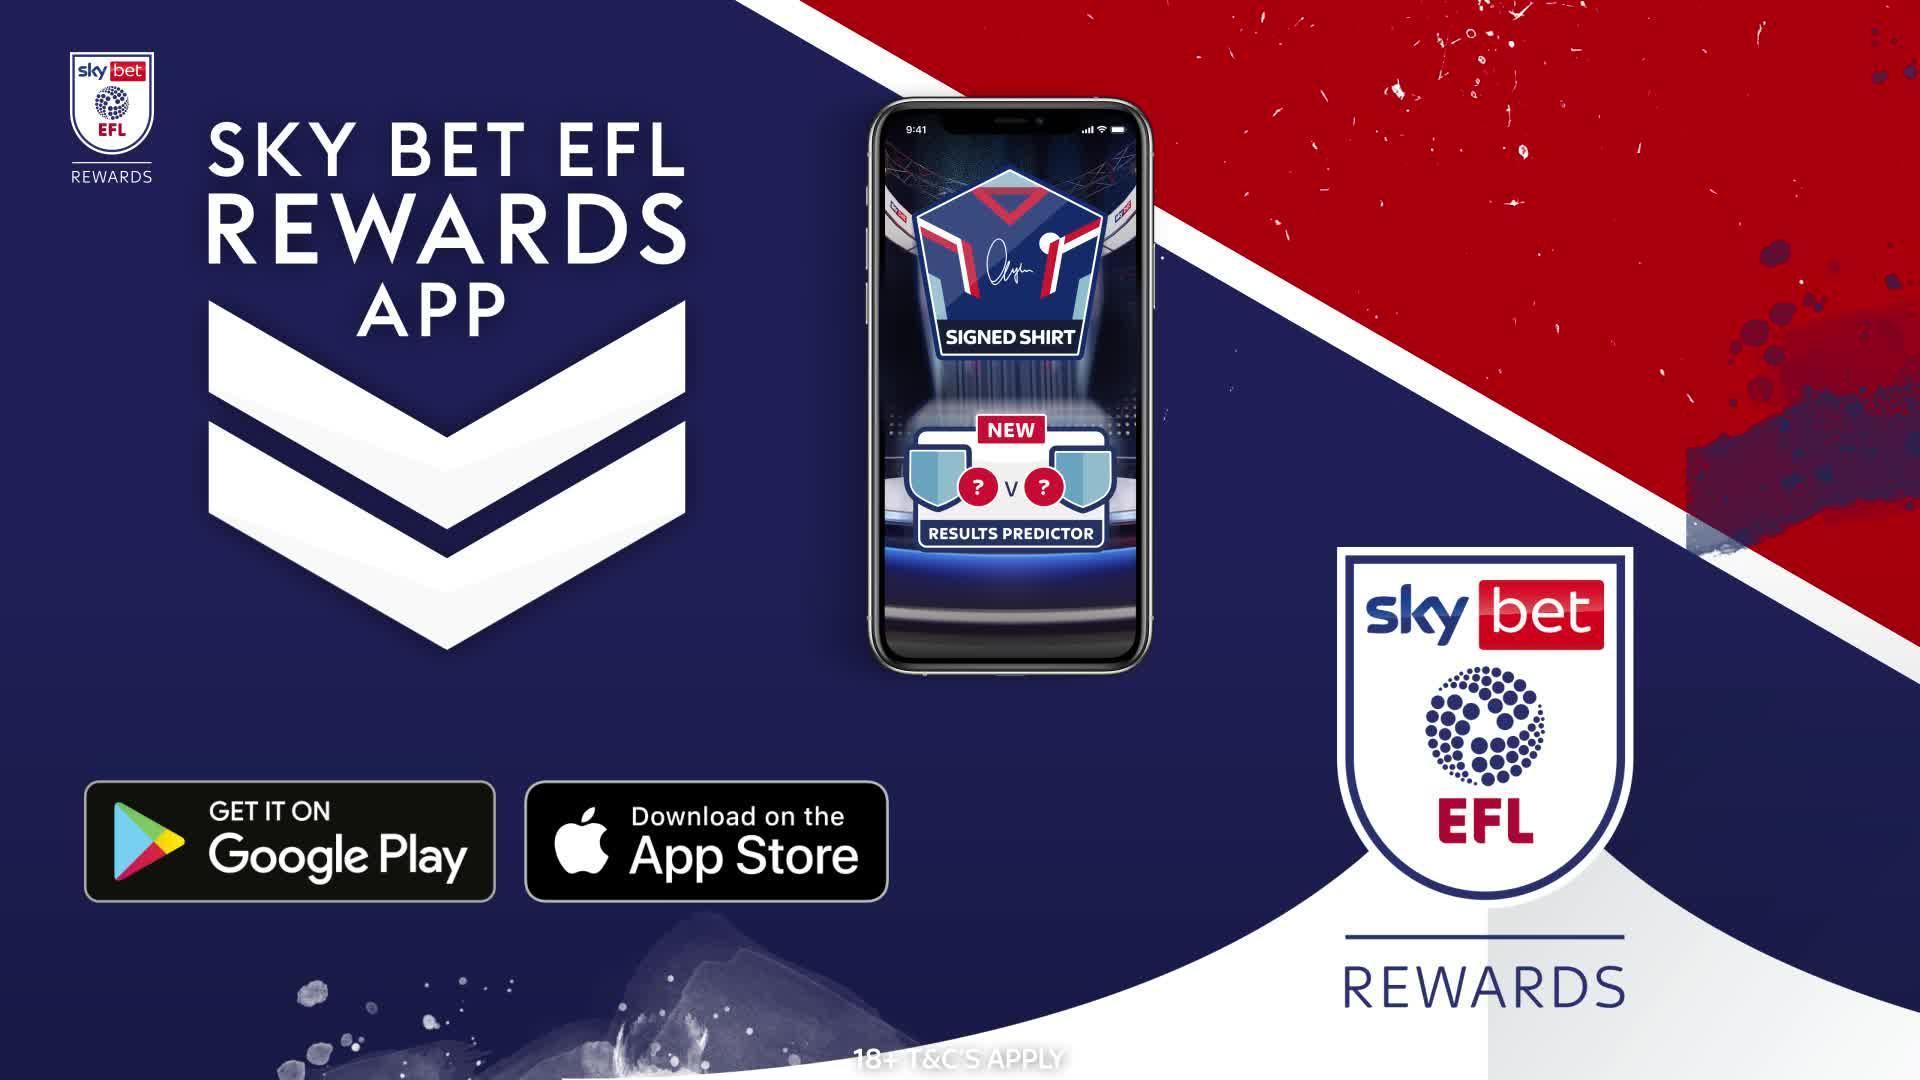 EFL REWARDS